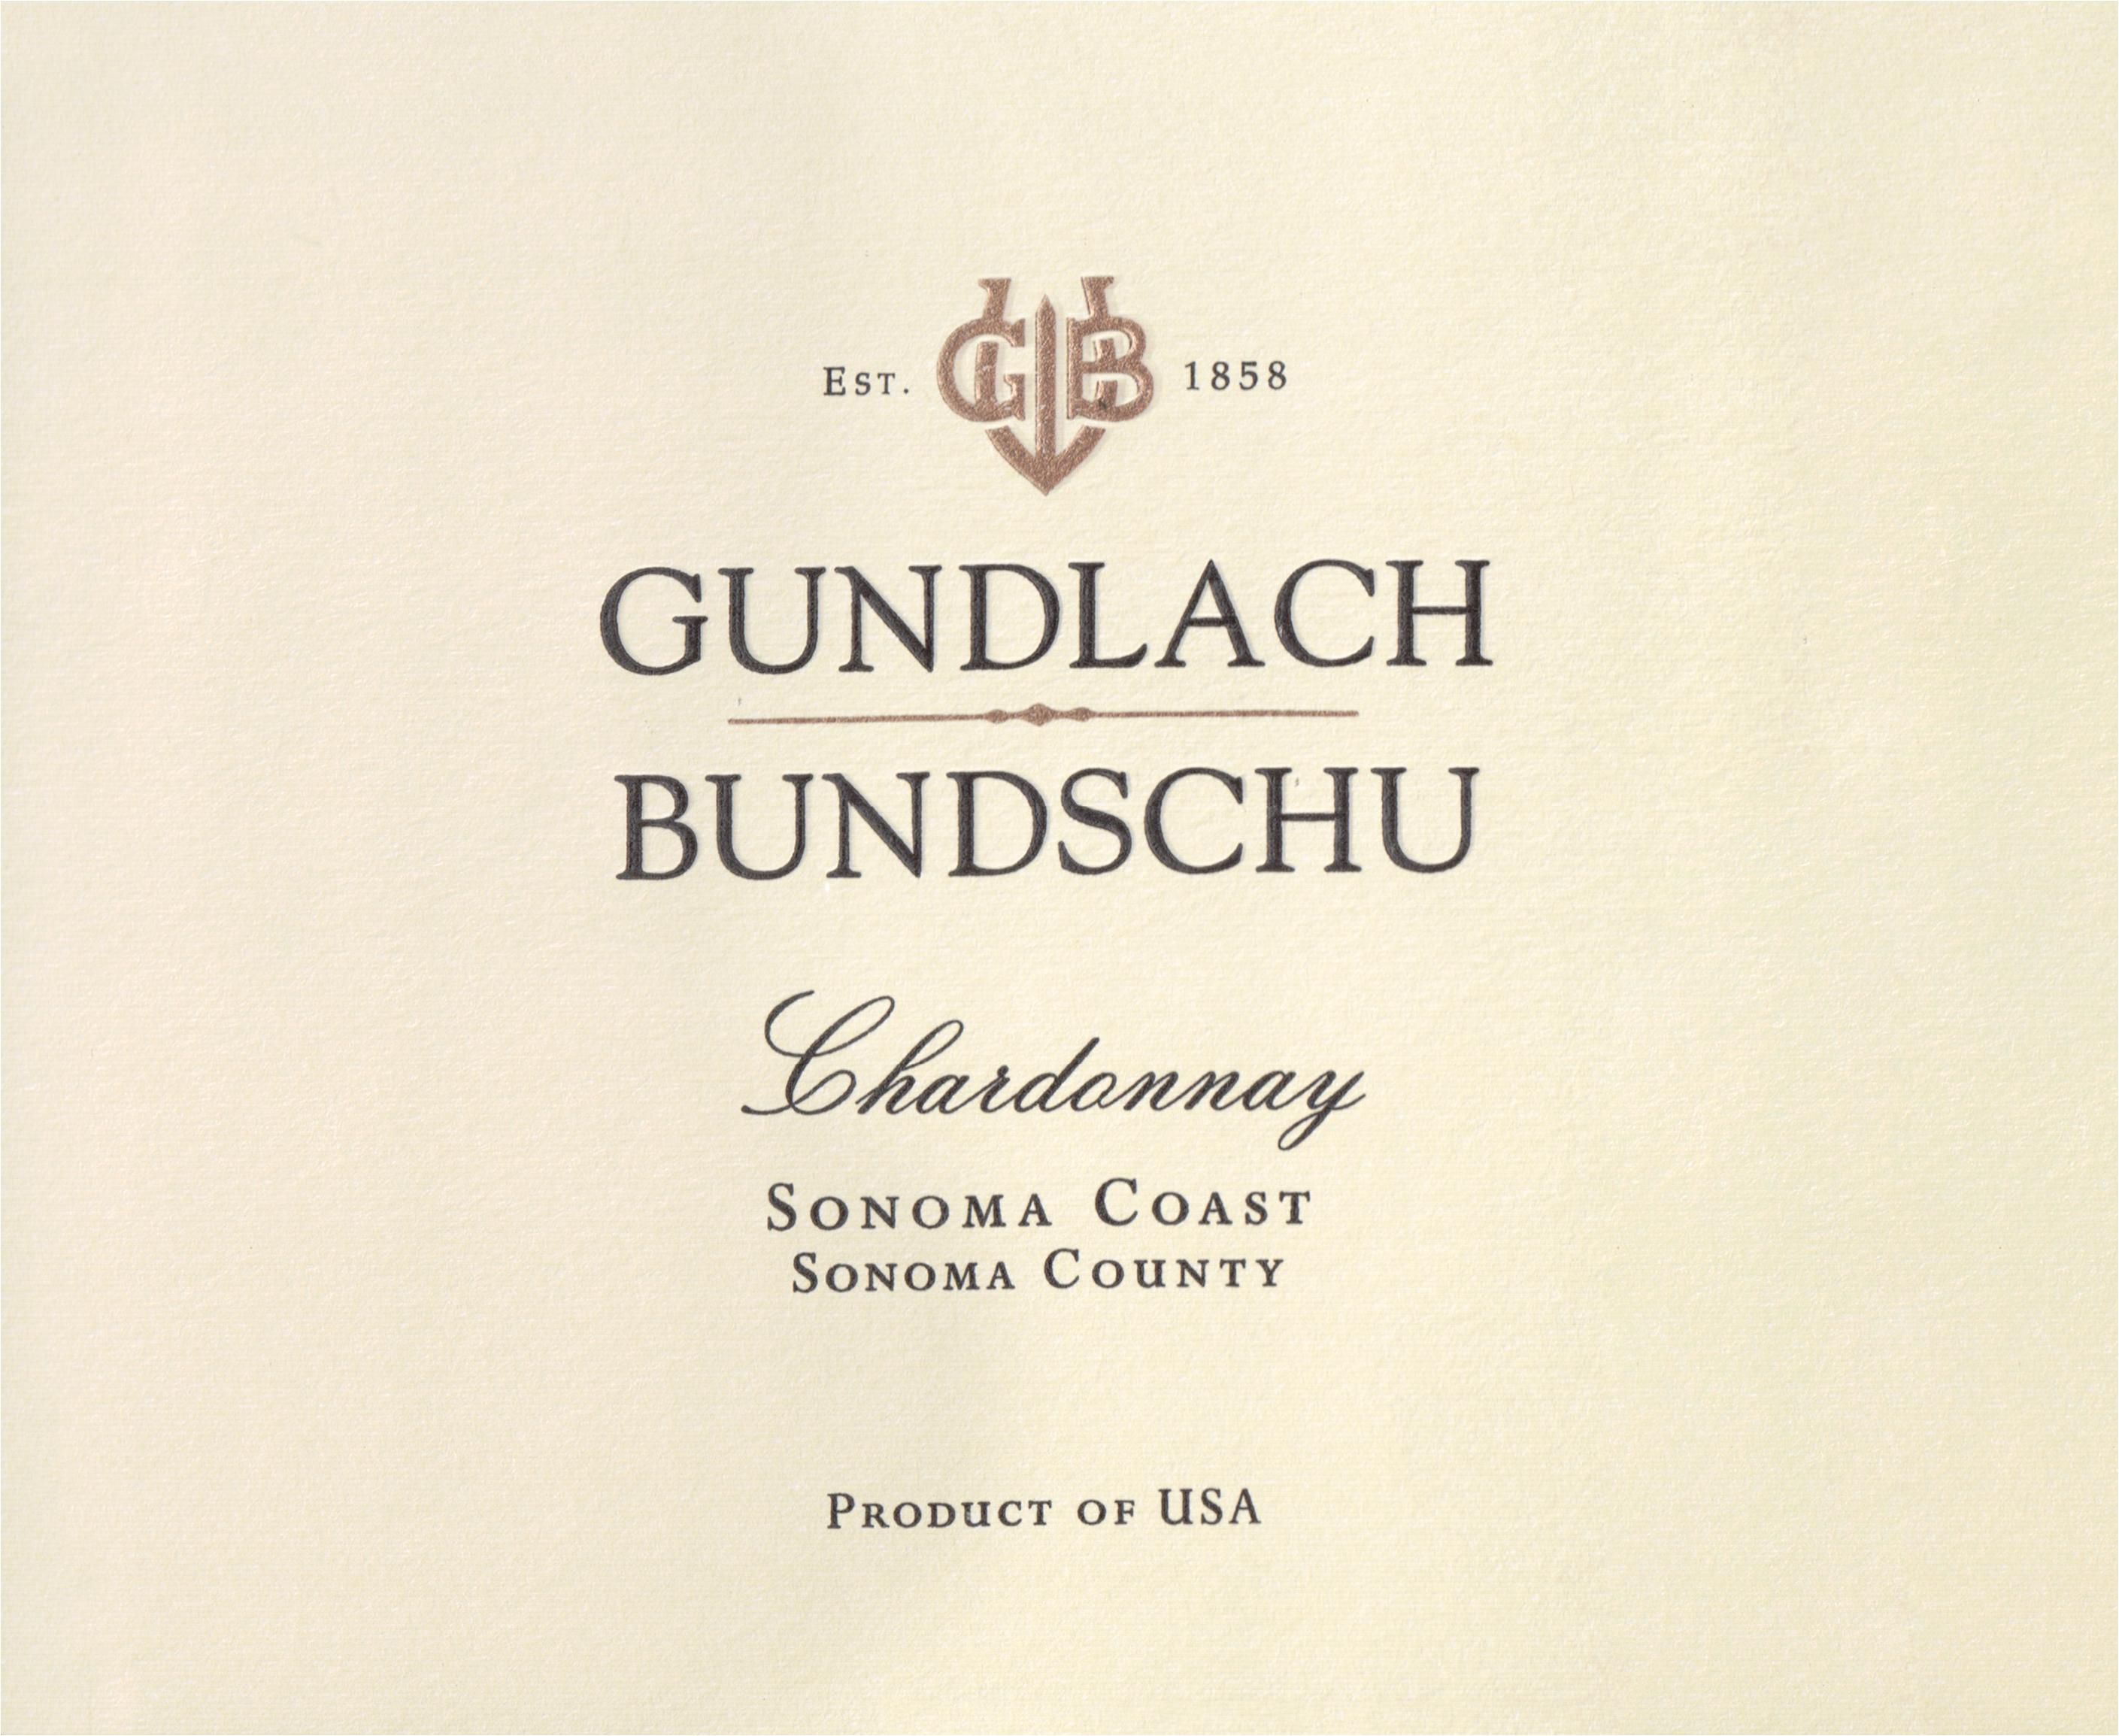 Gundlach Bundschu Estate Chardonnay Sonoma County 2018